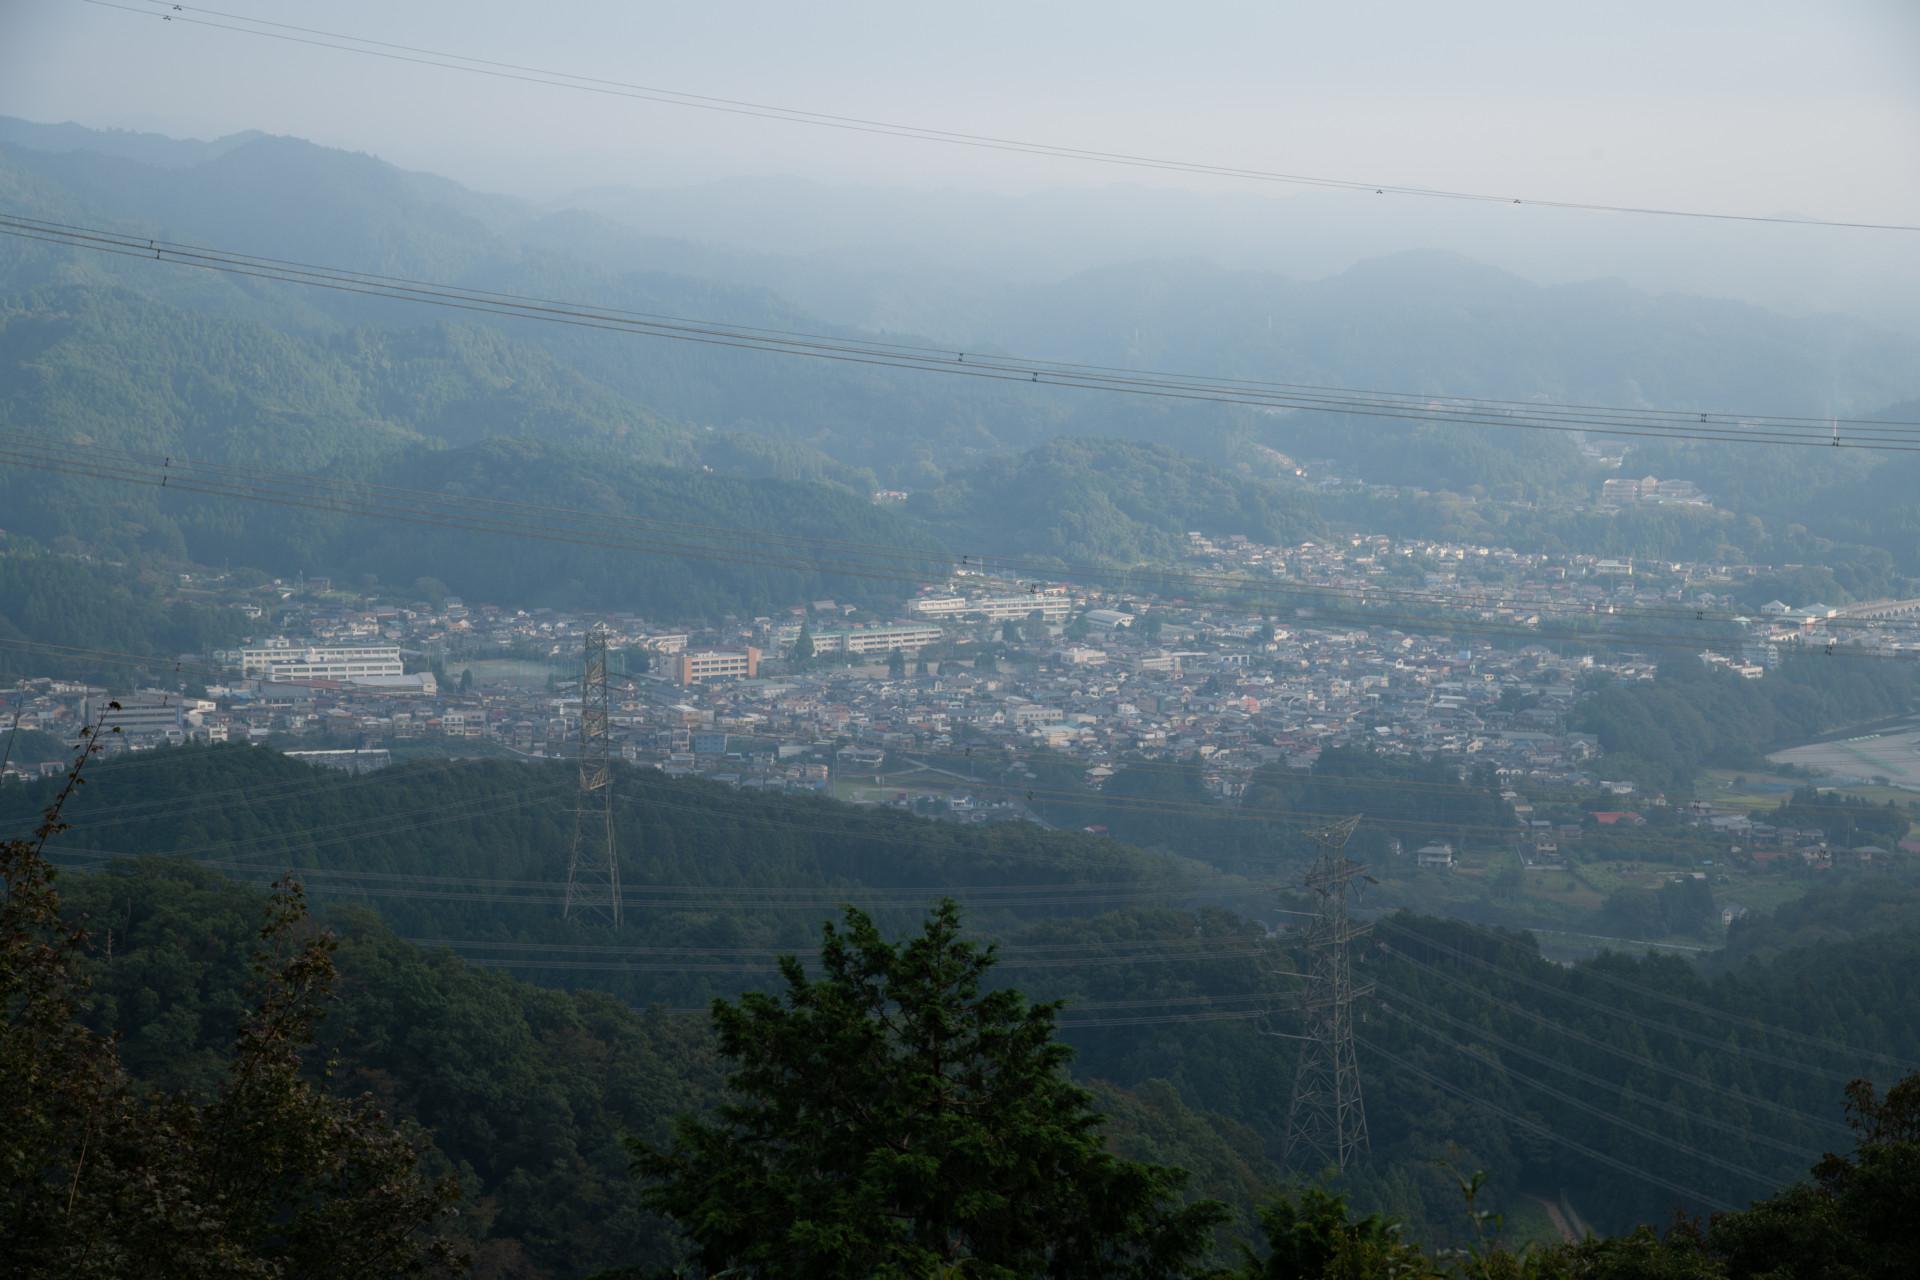 DSC_7977 登山録 今熊山(八王子市上川町)